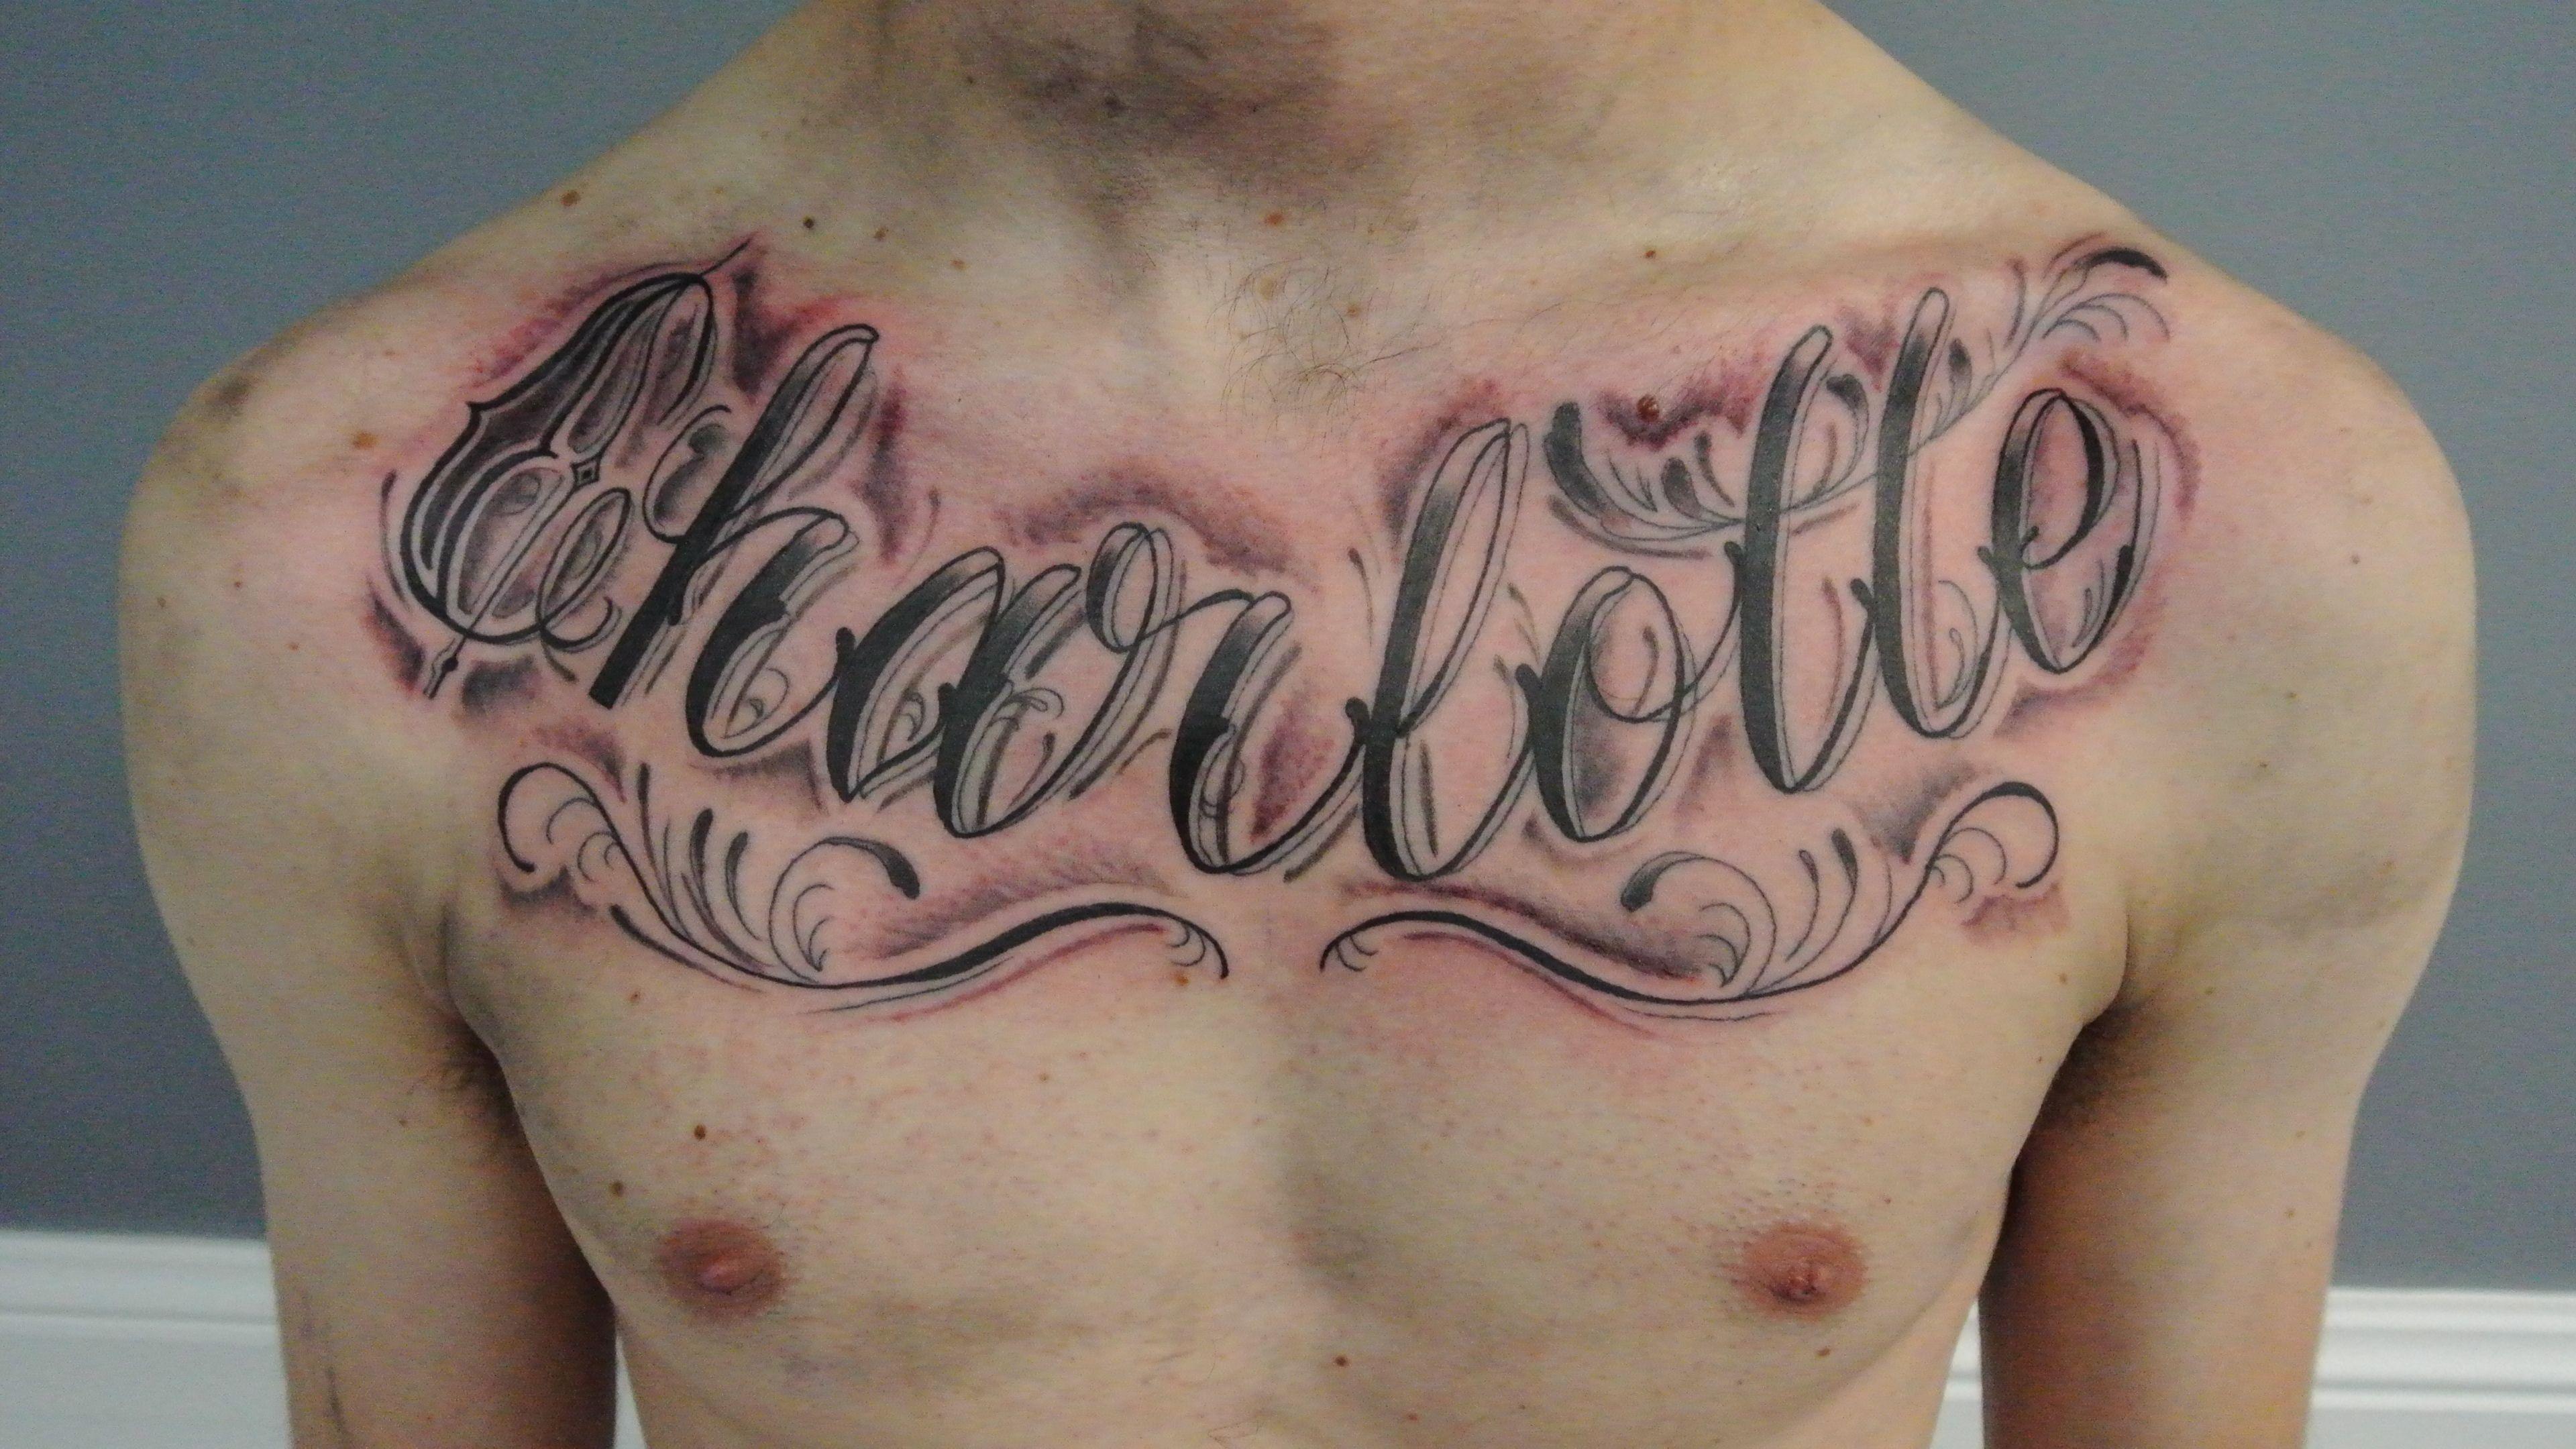 Tattoo By Lou Shaw Four Aces Tattoo Aldinga Beach South Australia 8556 5467 Custom Drawn Script Done In Black And Name Tattoo Tattoos For Guys Ace Tattoo